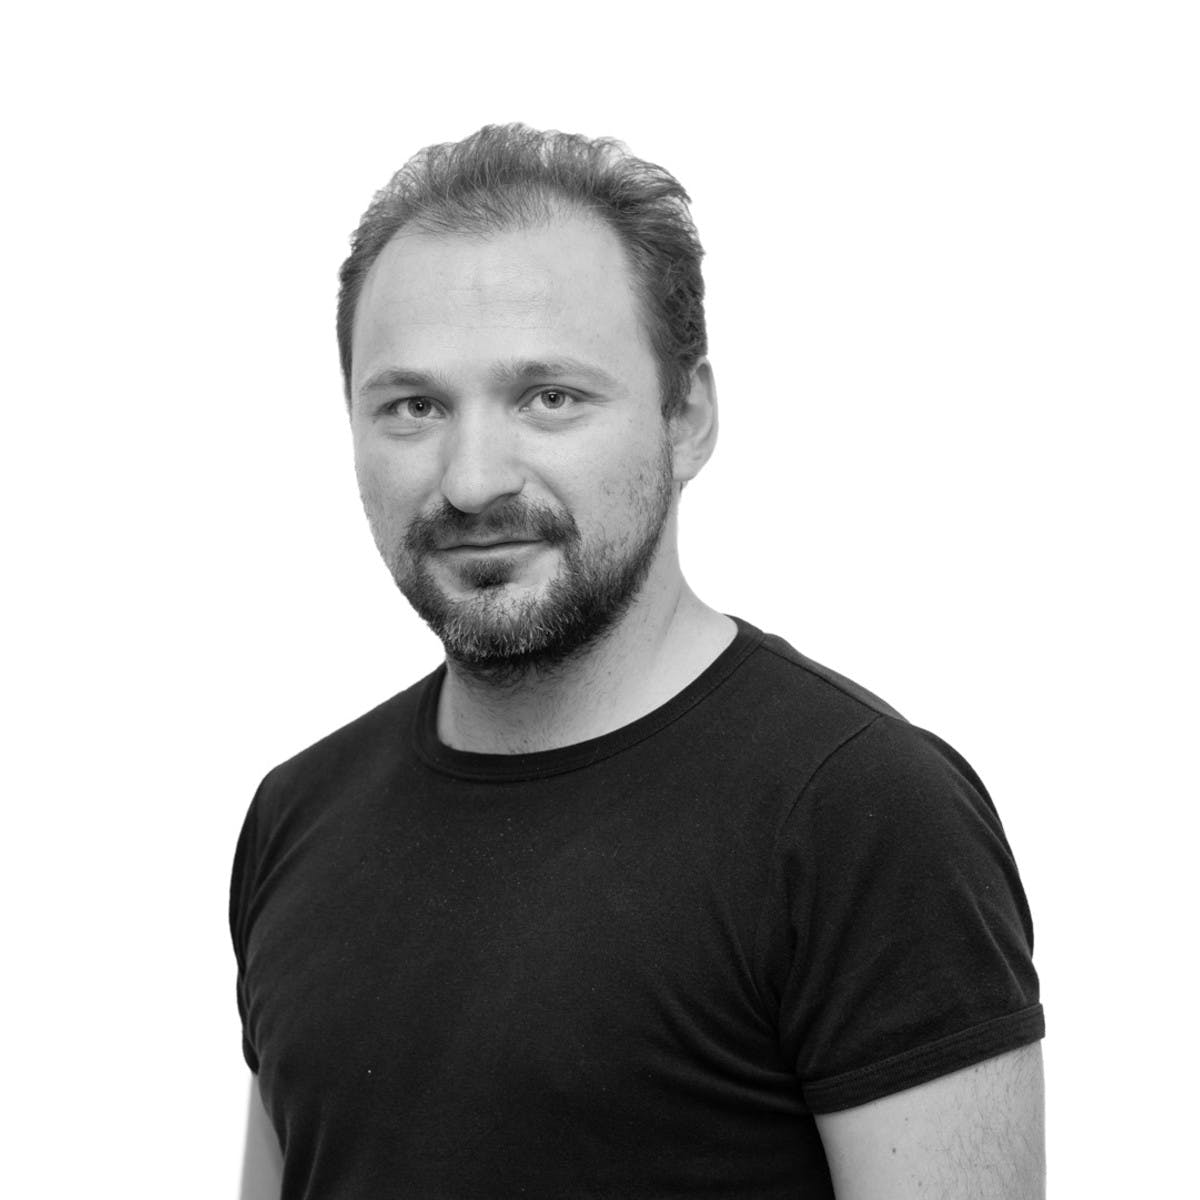 Misha Vucicevic